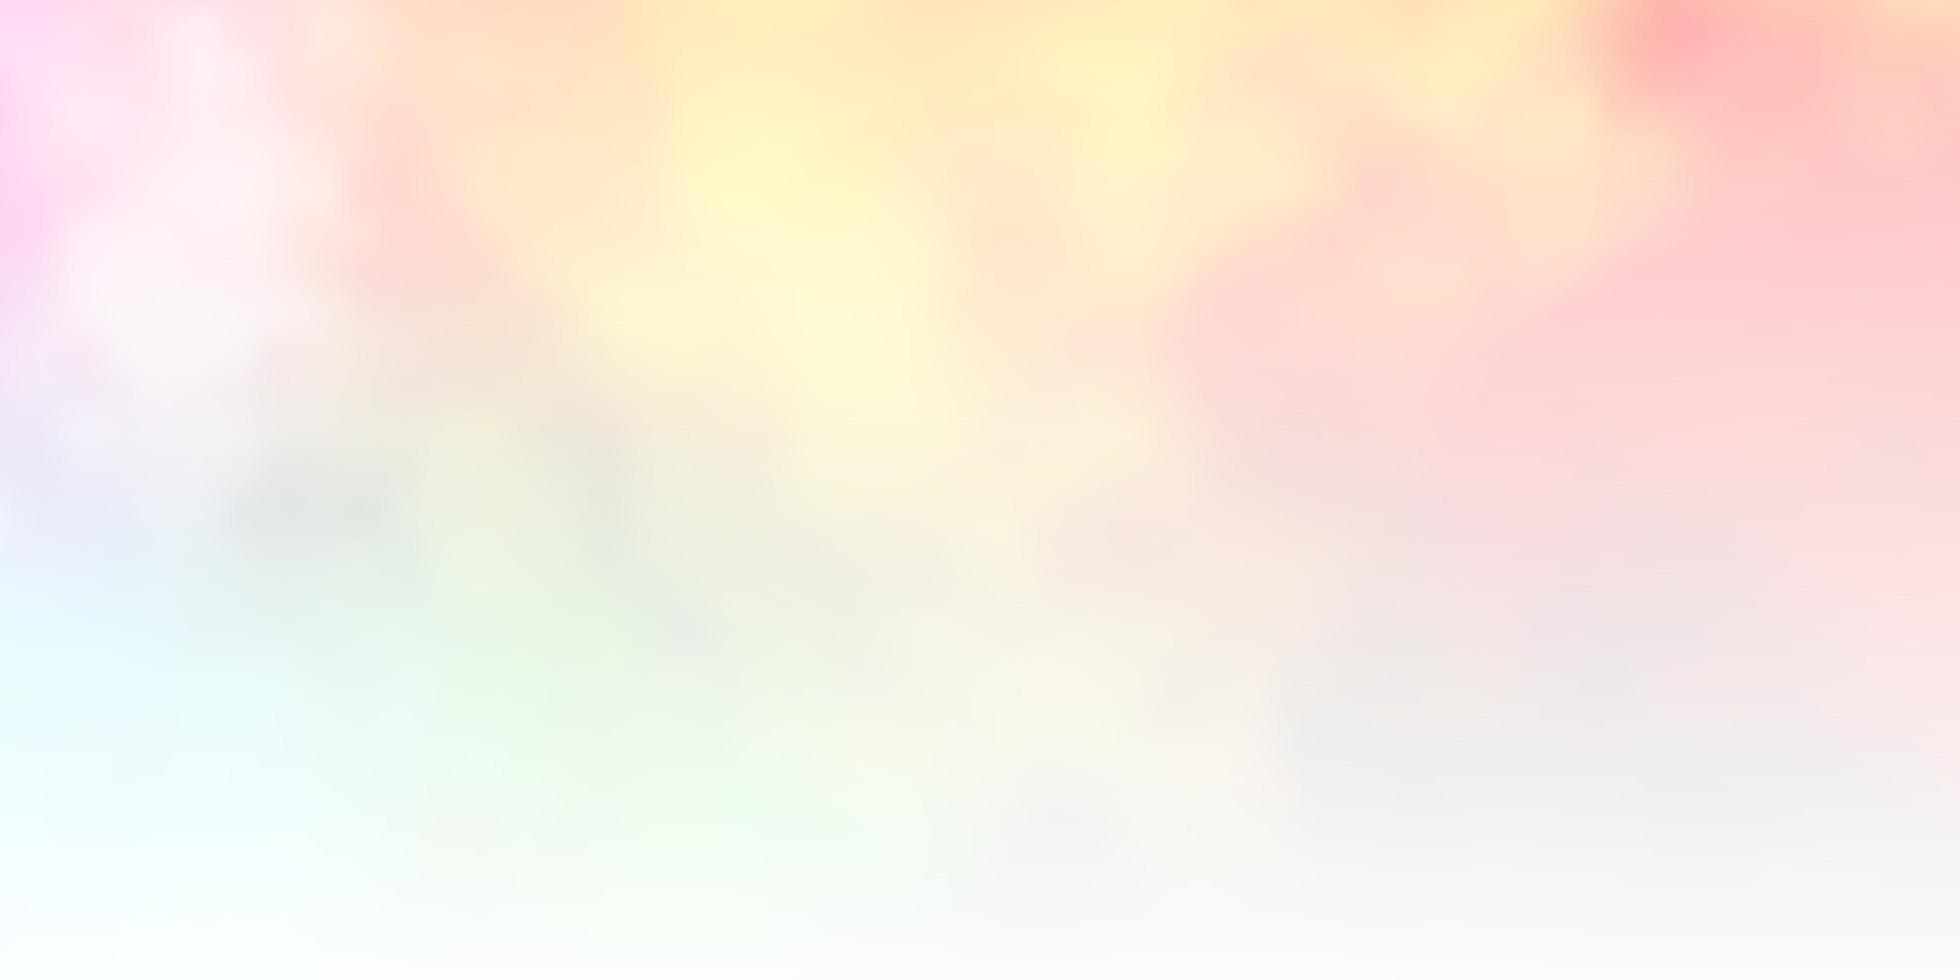 ljus flerfärgad bakgrund med cumulus. vektor